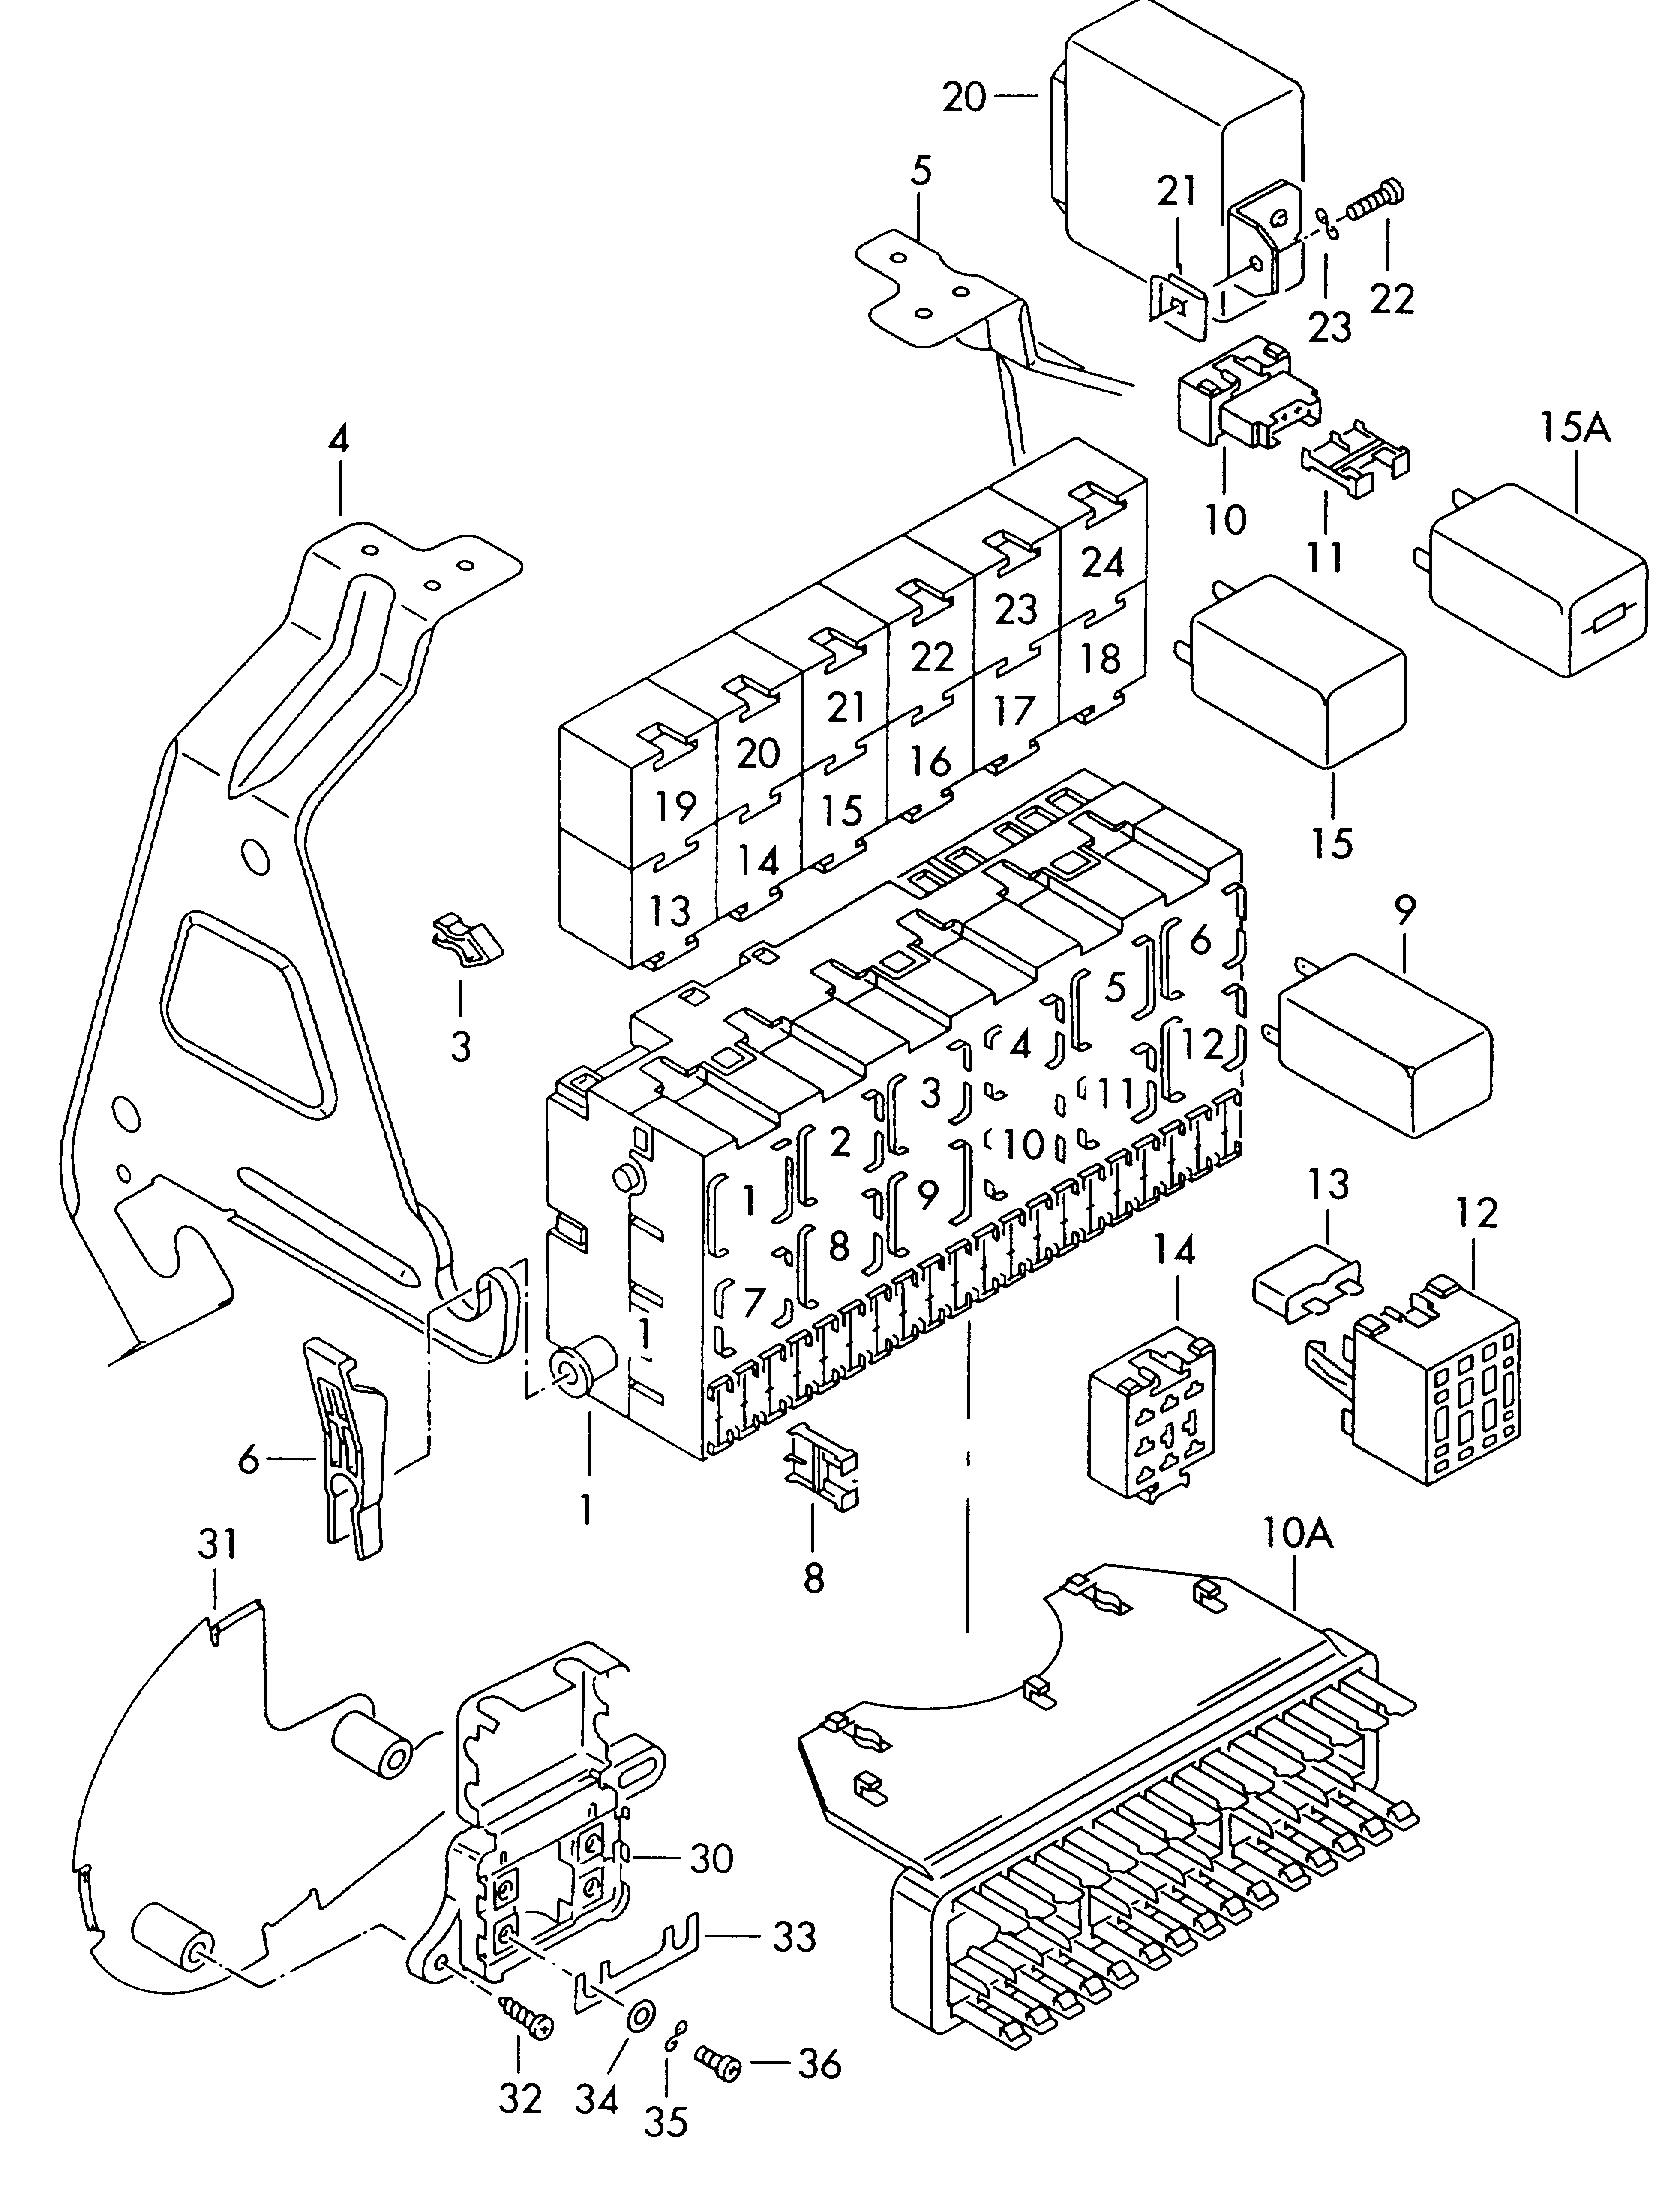 Volkswagen EuroVan (1995 - 1995) / VAG Etka